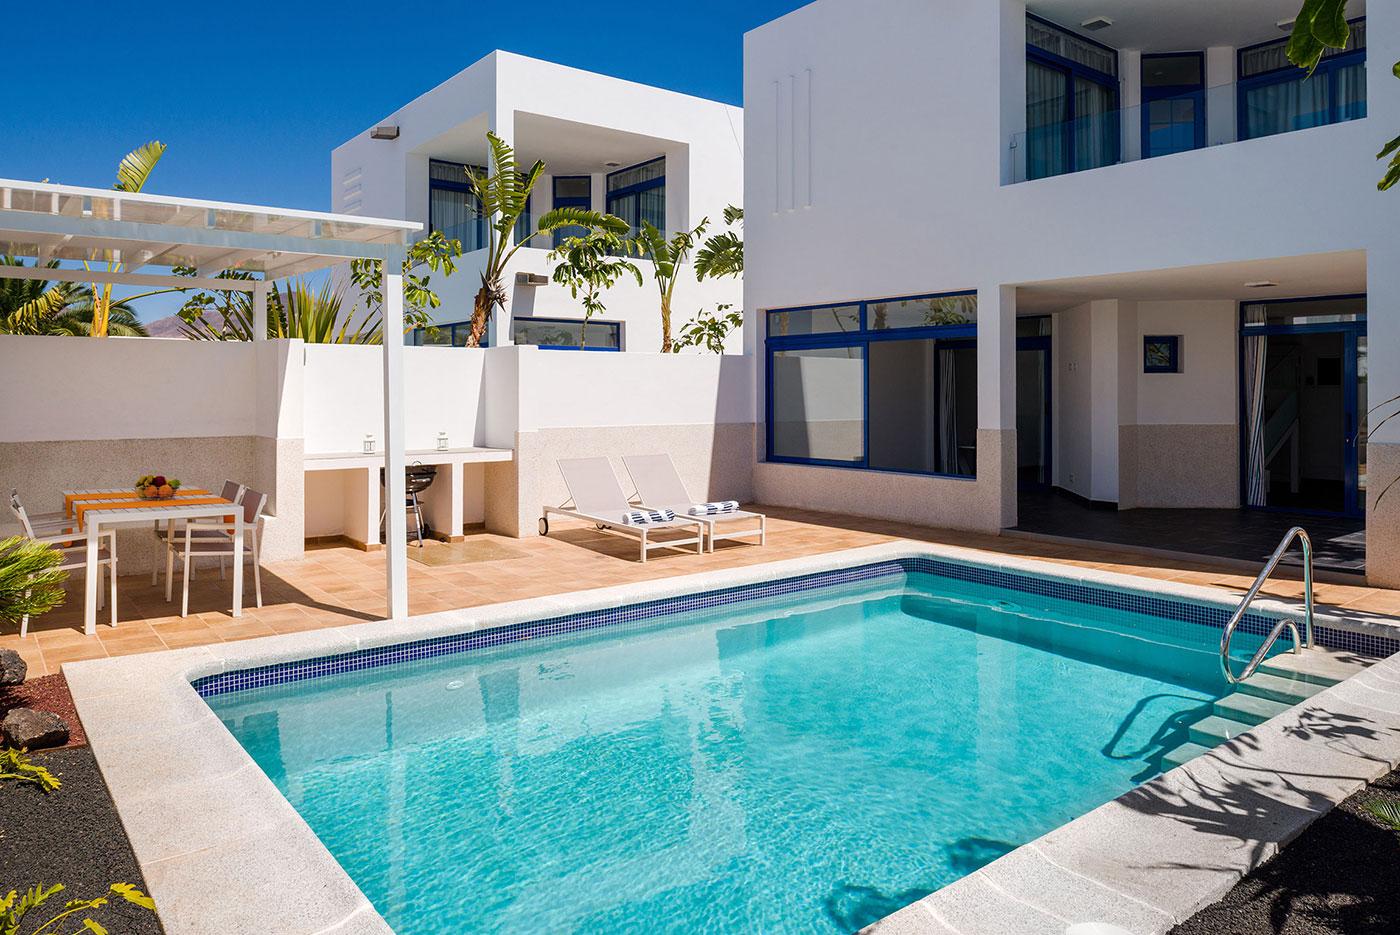 villas-de-la-marina-pool_4